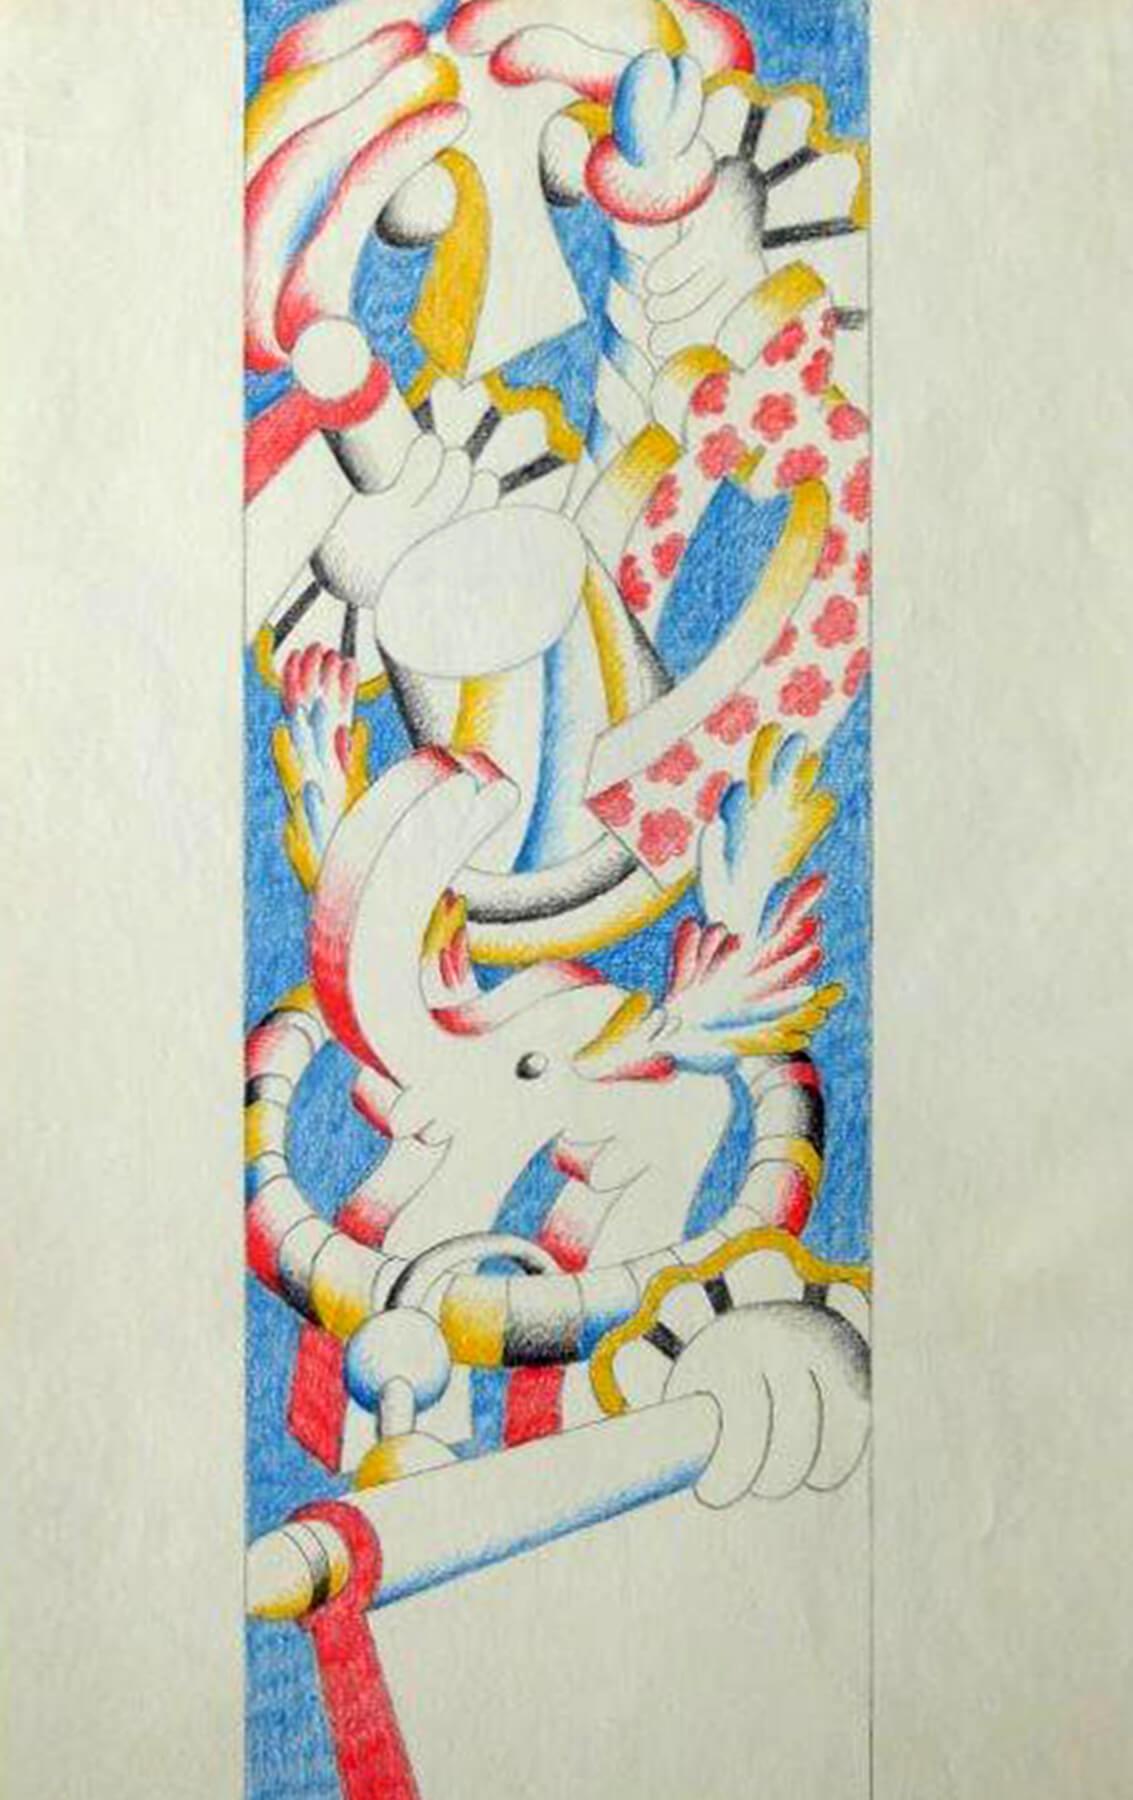 Barbara Jäger Kunstakademie Karlsruhe Faschingsplakat 1971